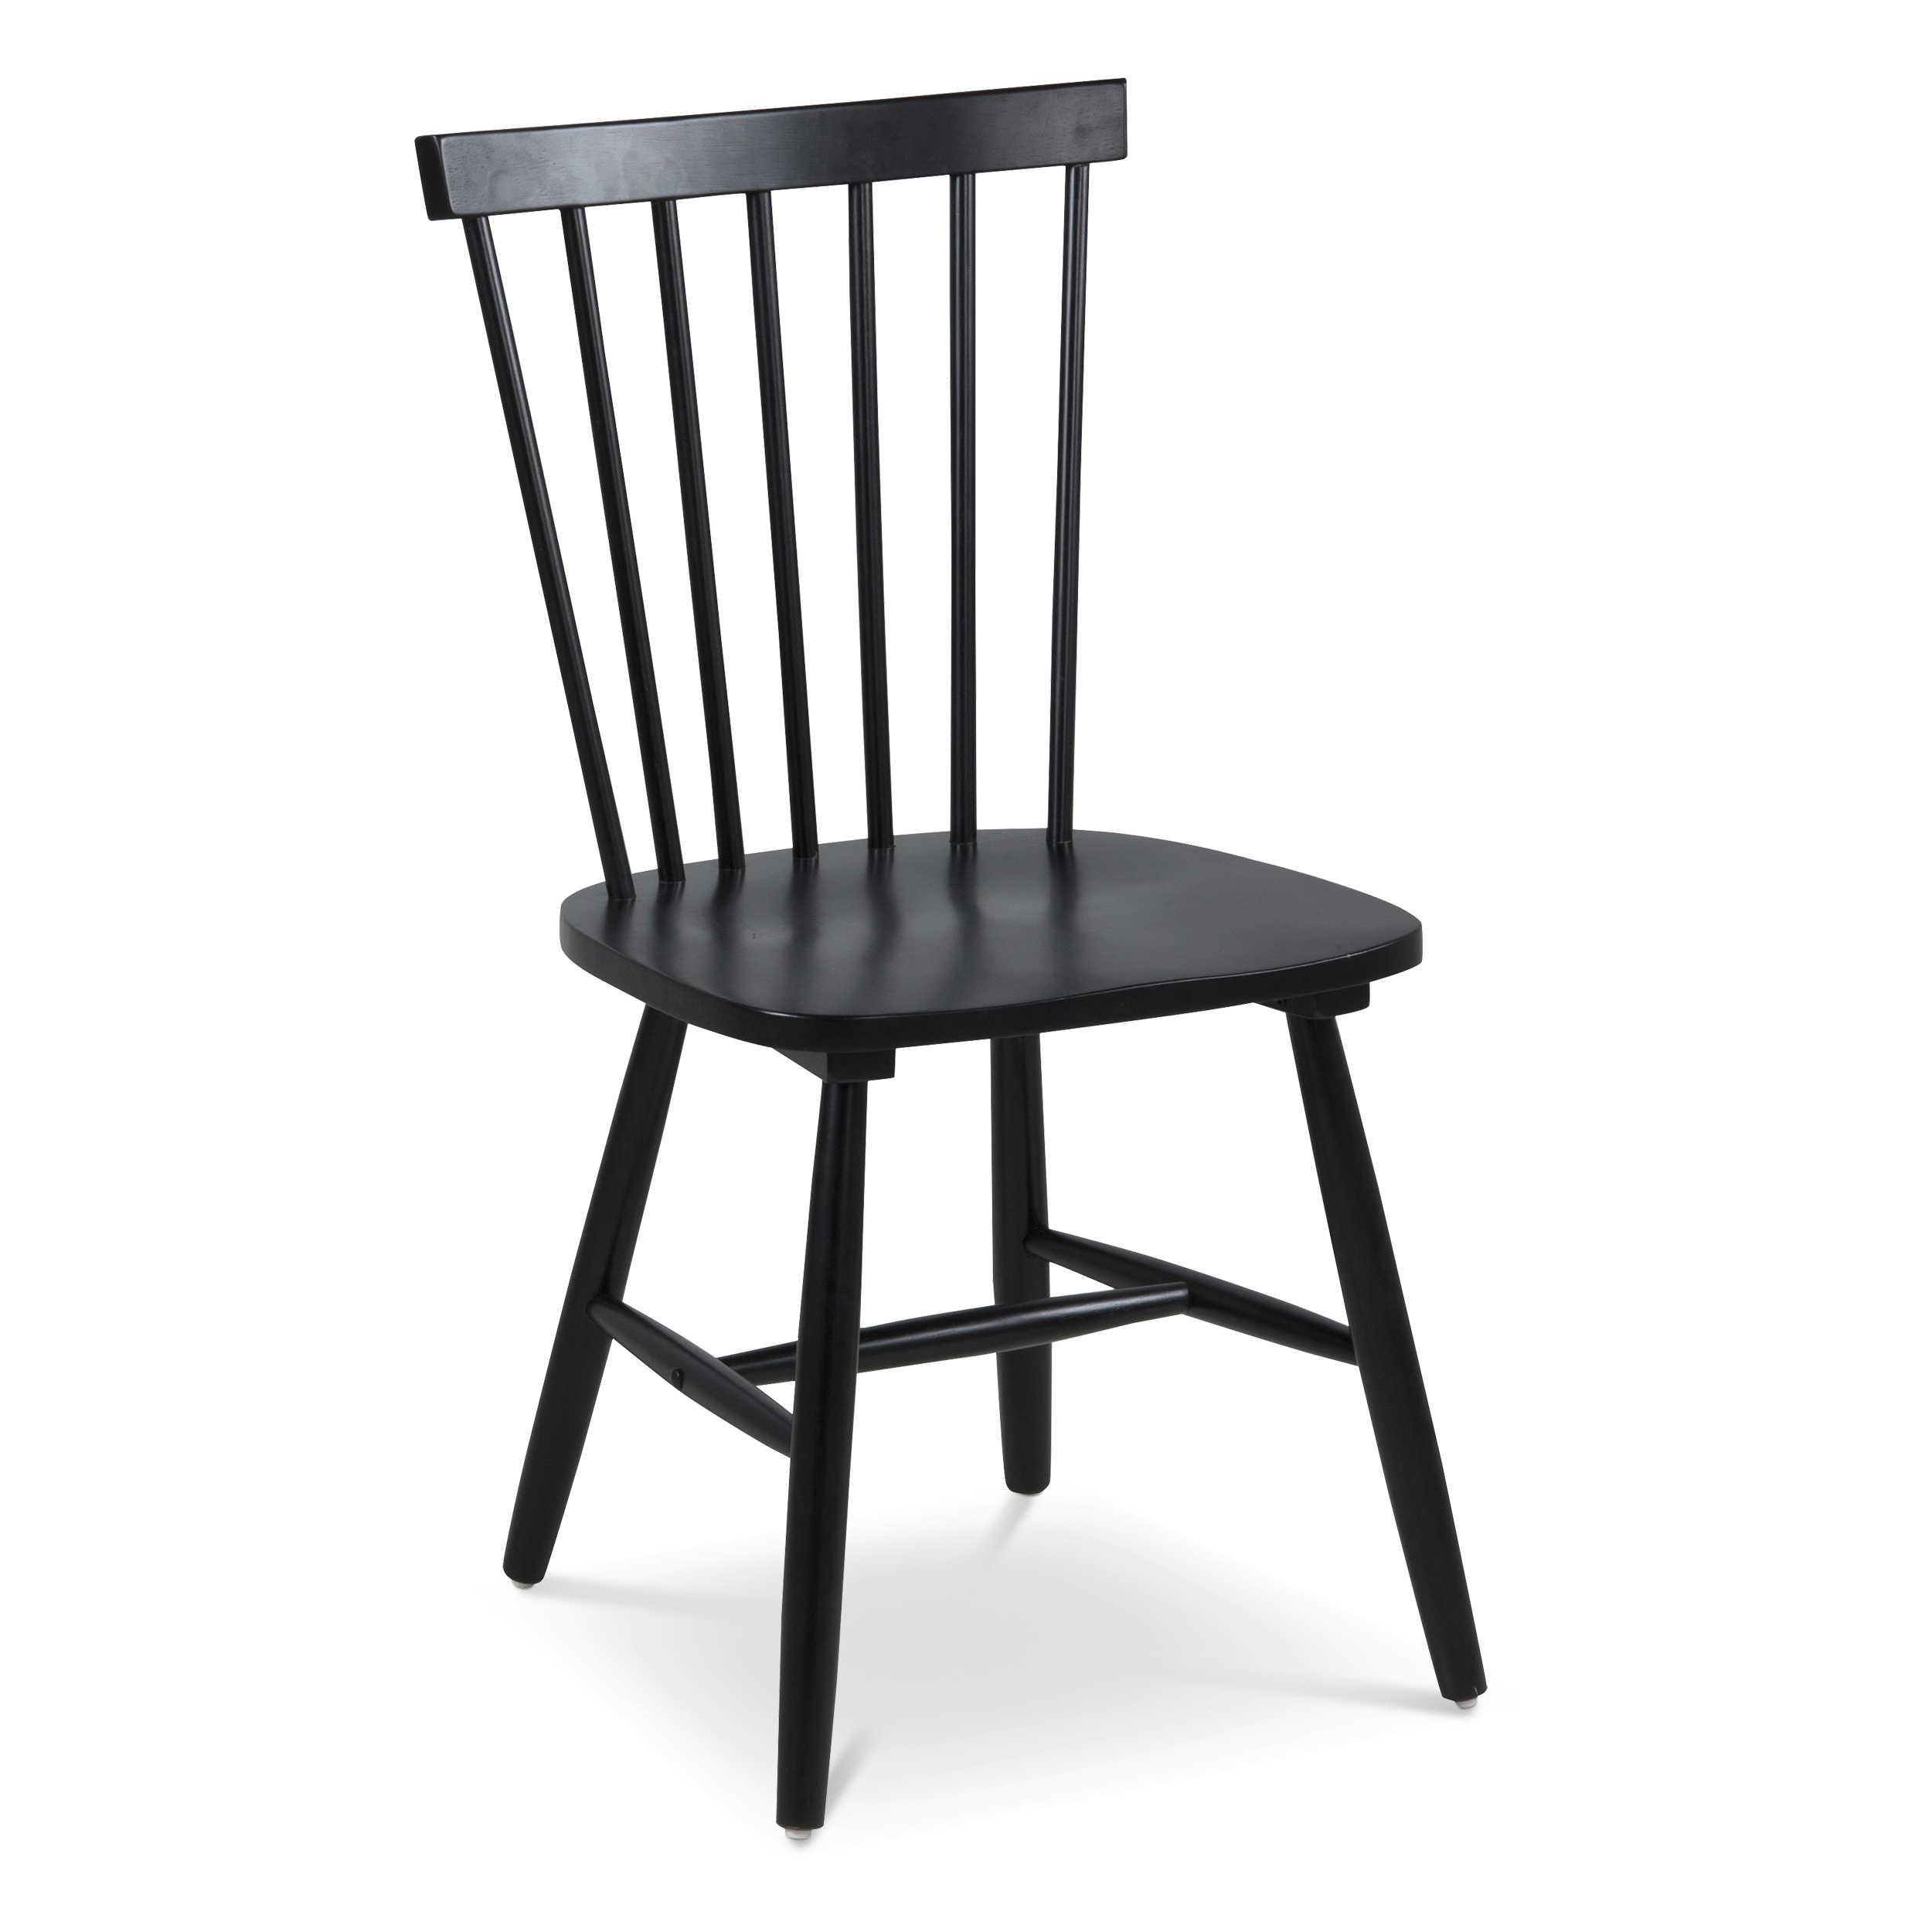 Actona stuhl riano schwarz holz online kaufen bei woonio - Stuhl holz schwarz ...